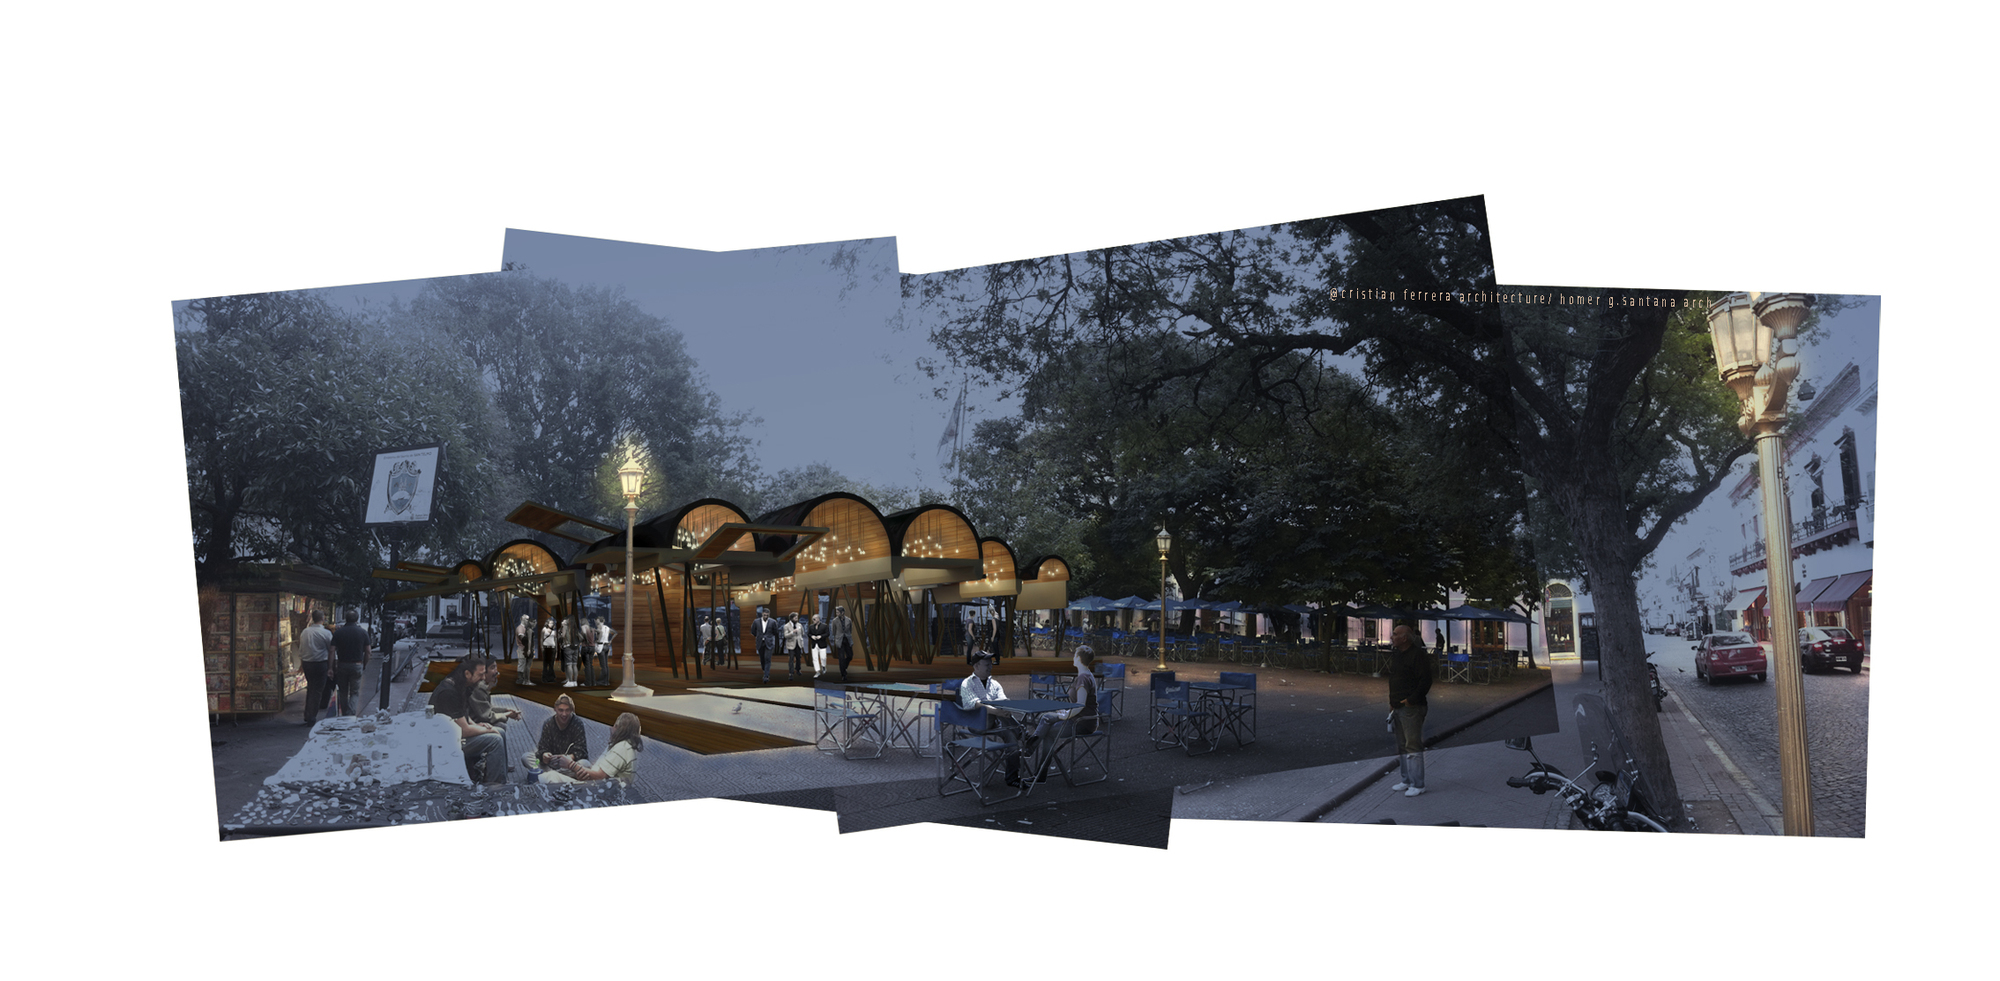 Cristi n ferrera architecture y homer garc a santana for Arquitectura parametrica